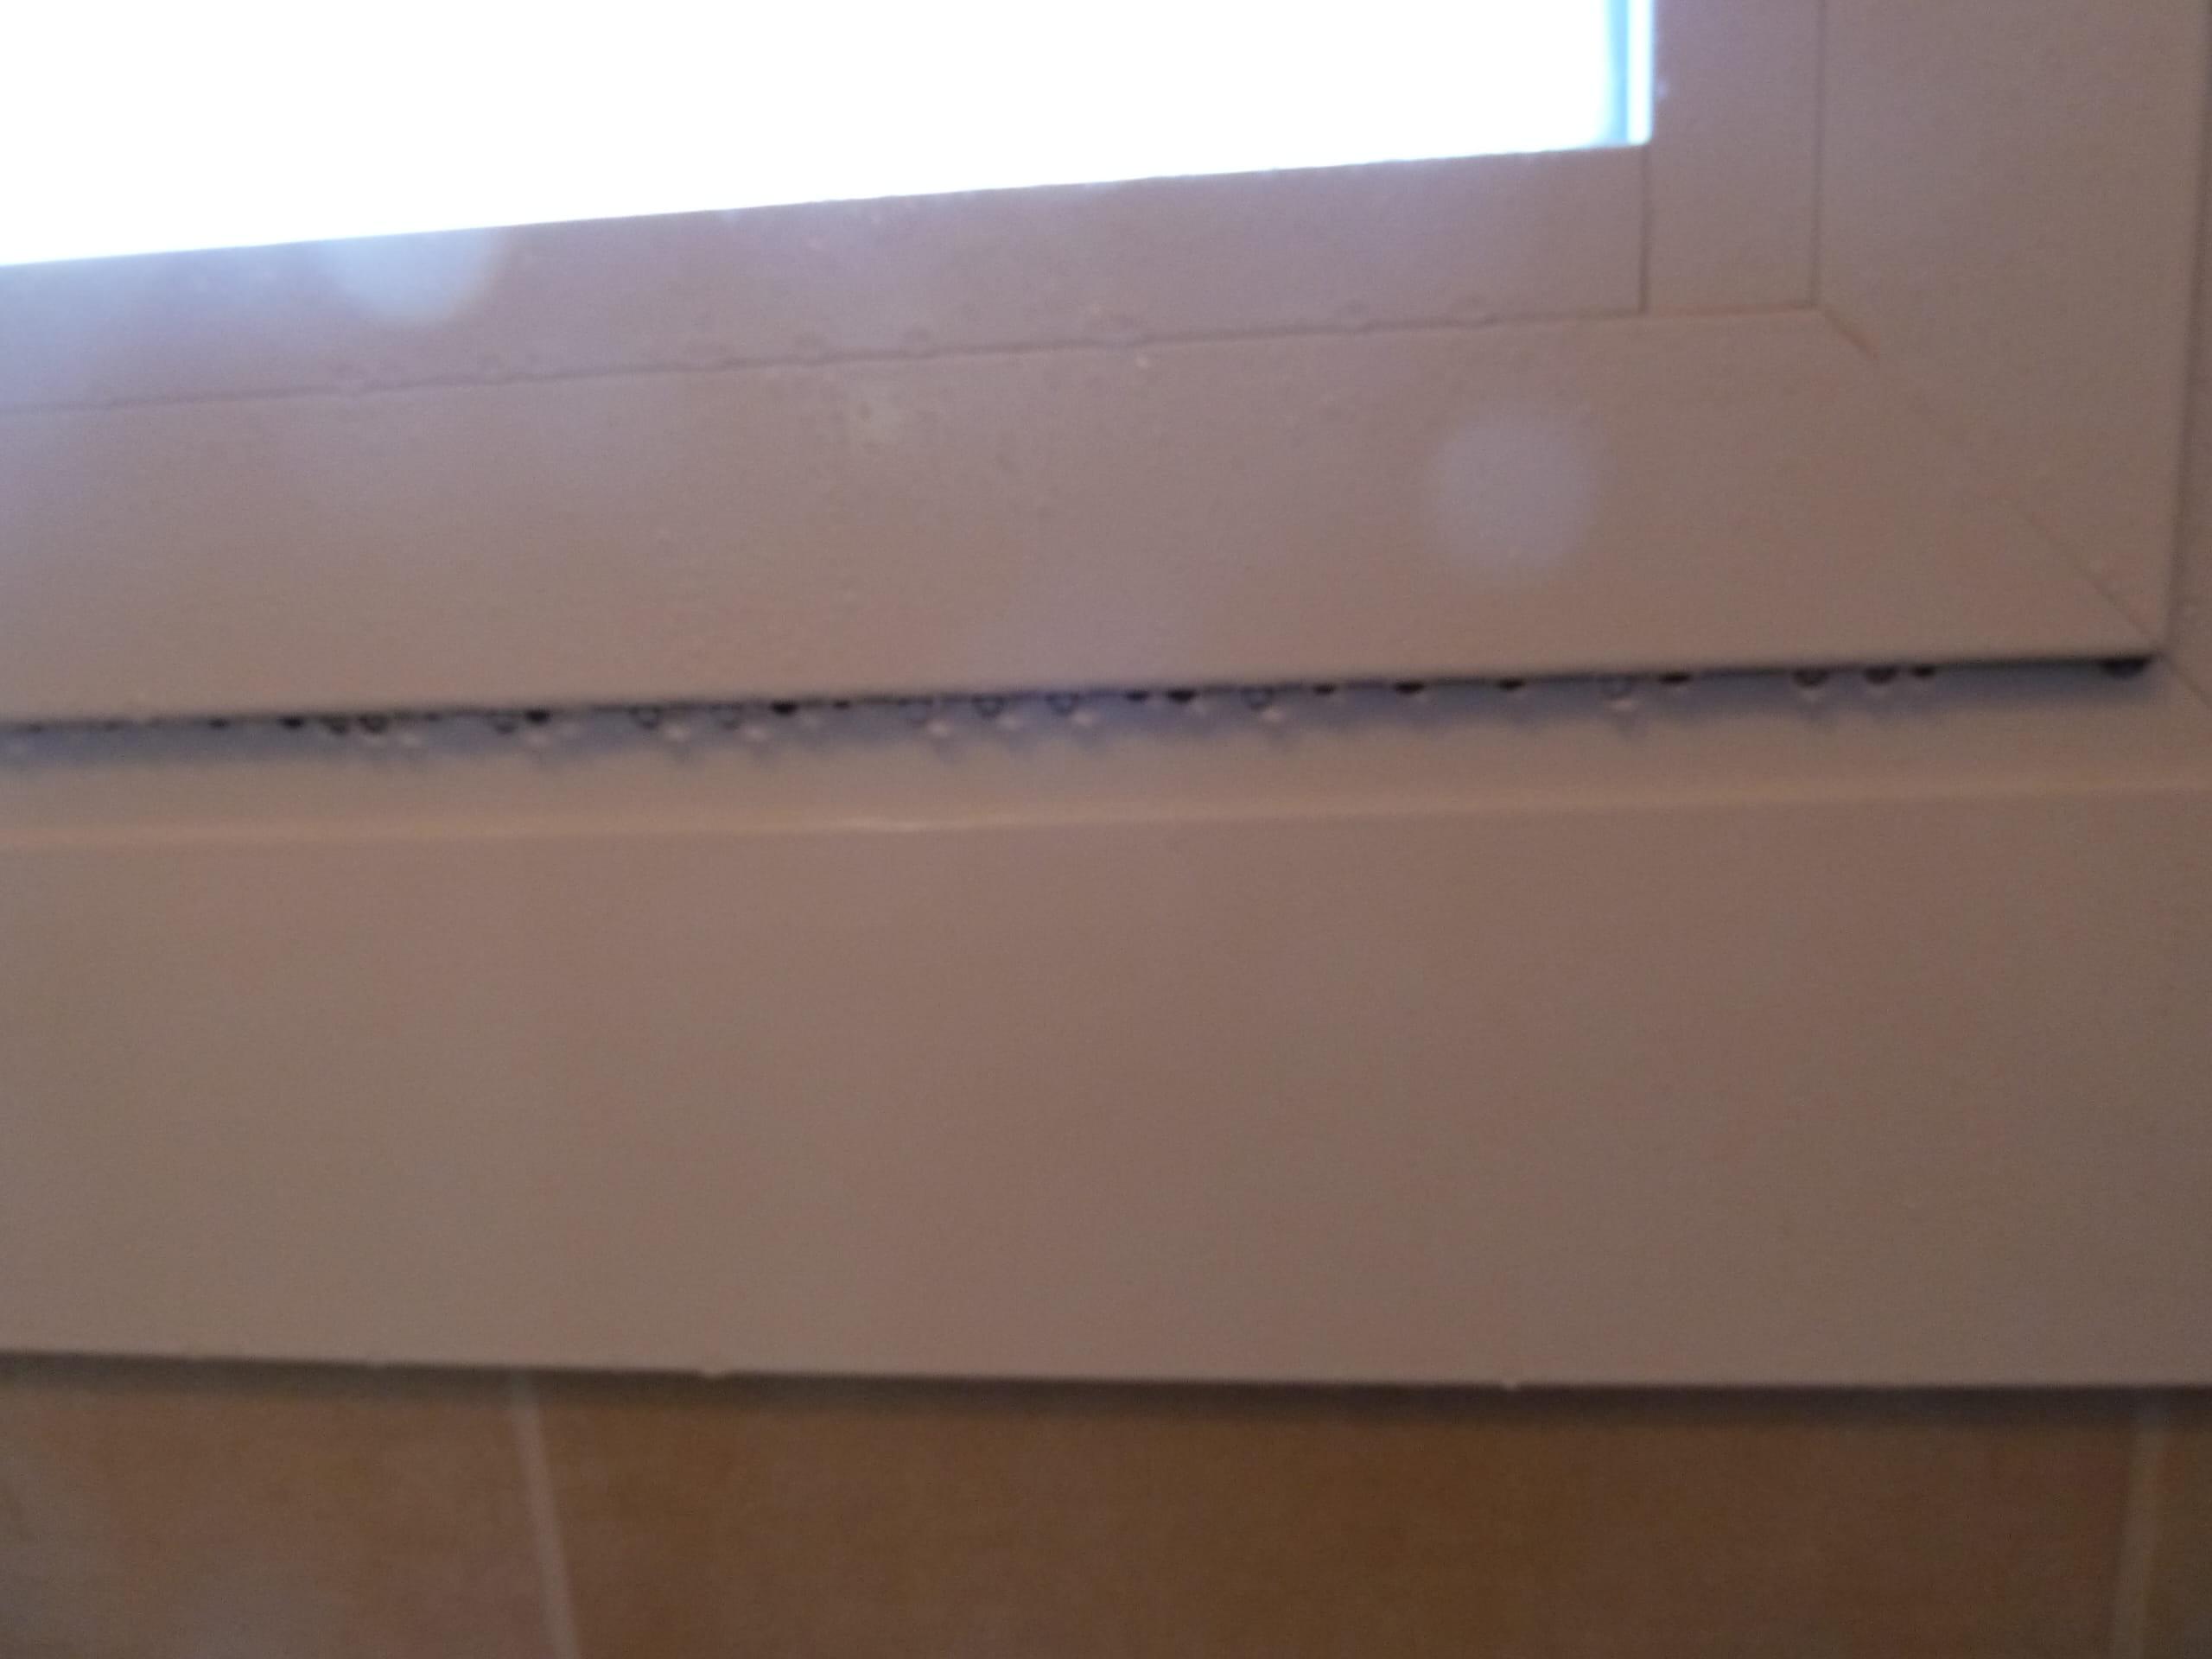 comment poser des grilles de ventilation sur des fen tres alu. Black Bedroom Furniture Sets. Home Design Ideas